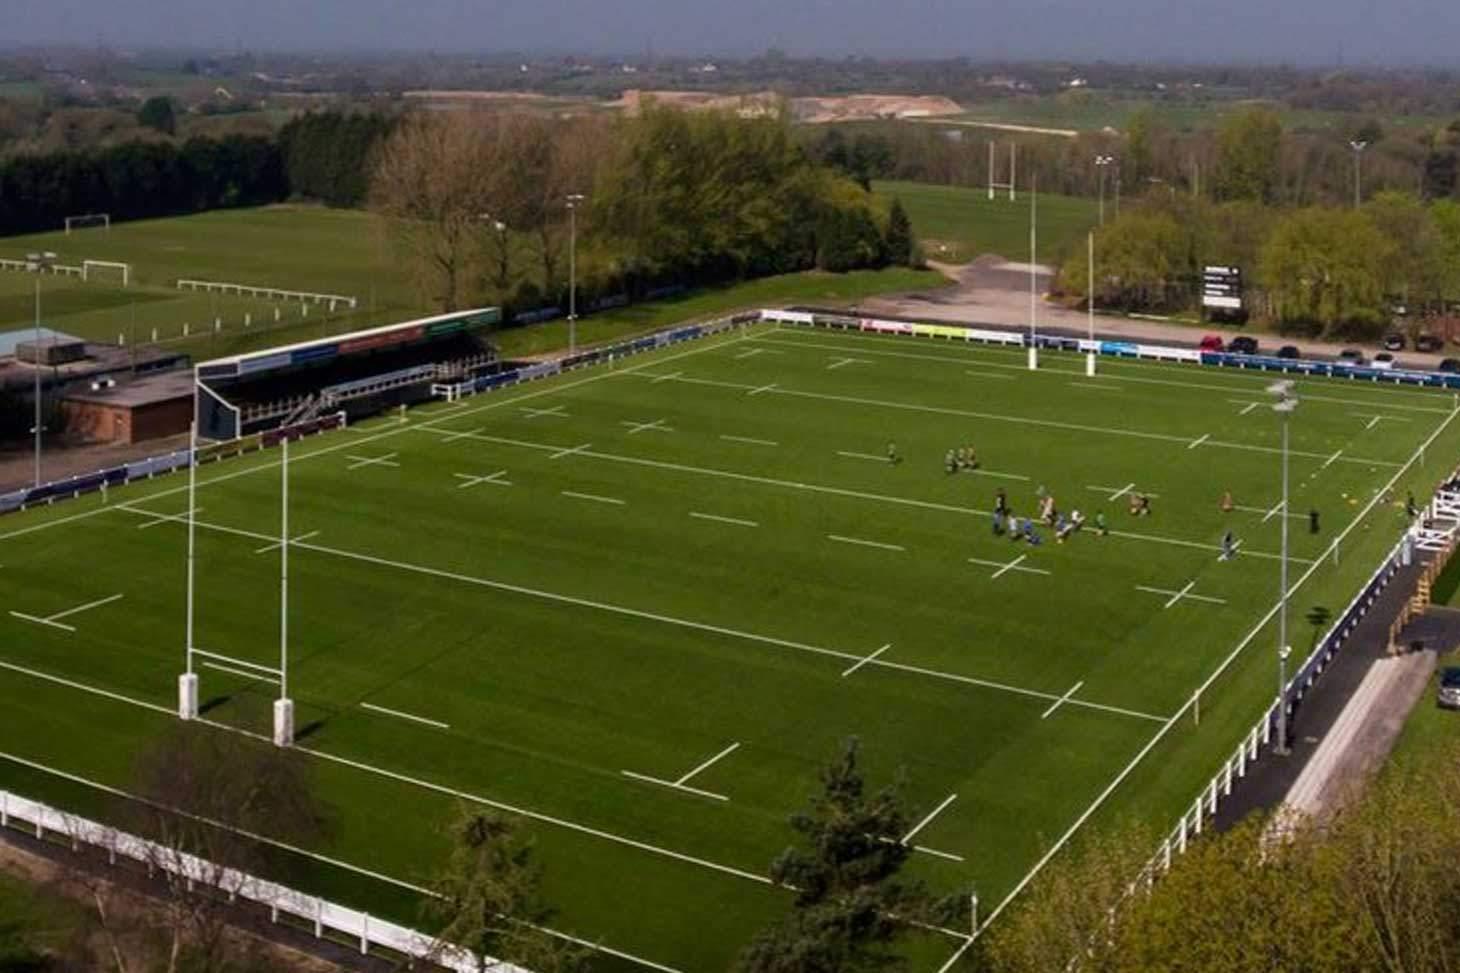 PlayFootball Preston Grasshoppers 8 a side | 3G Astroturf football pitch